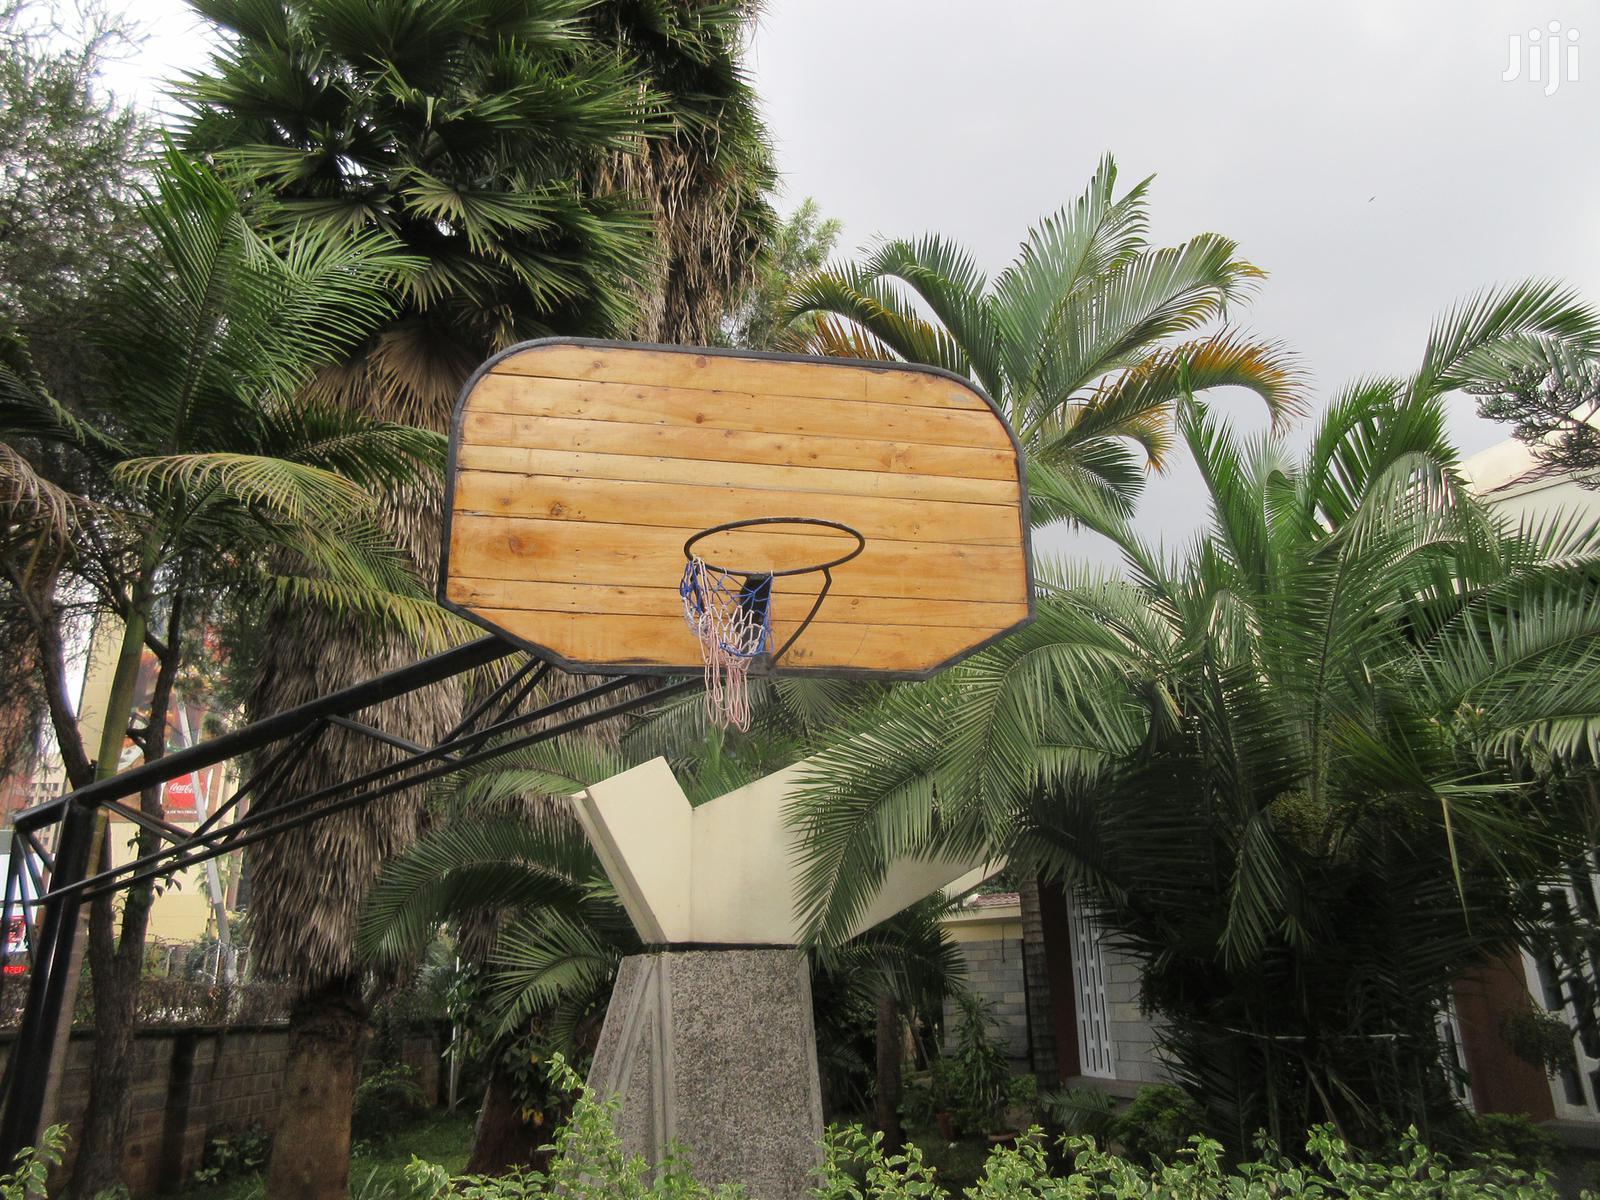 Basket Ball Court Hoop Construction And Set Up.